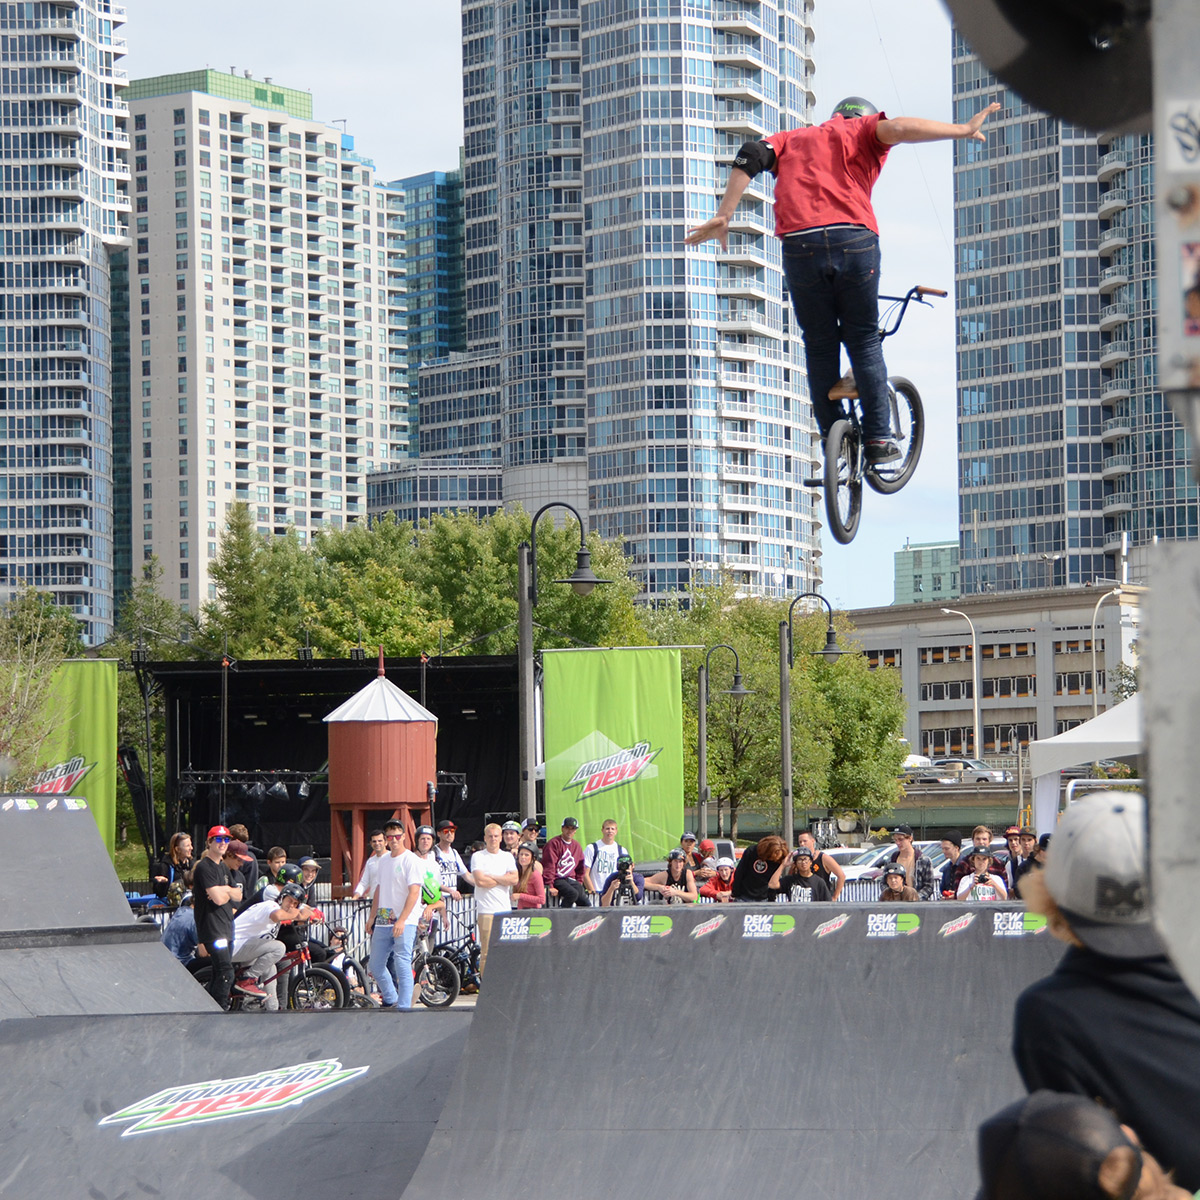 Suicide no hander at BMX Dew Tour Am Series in Toronto